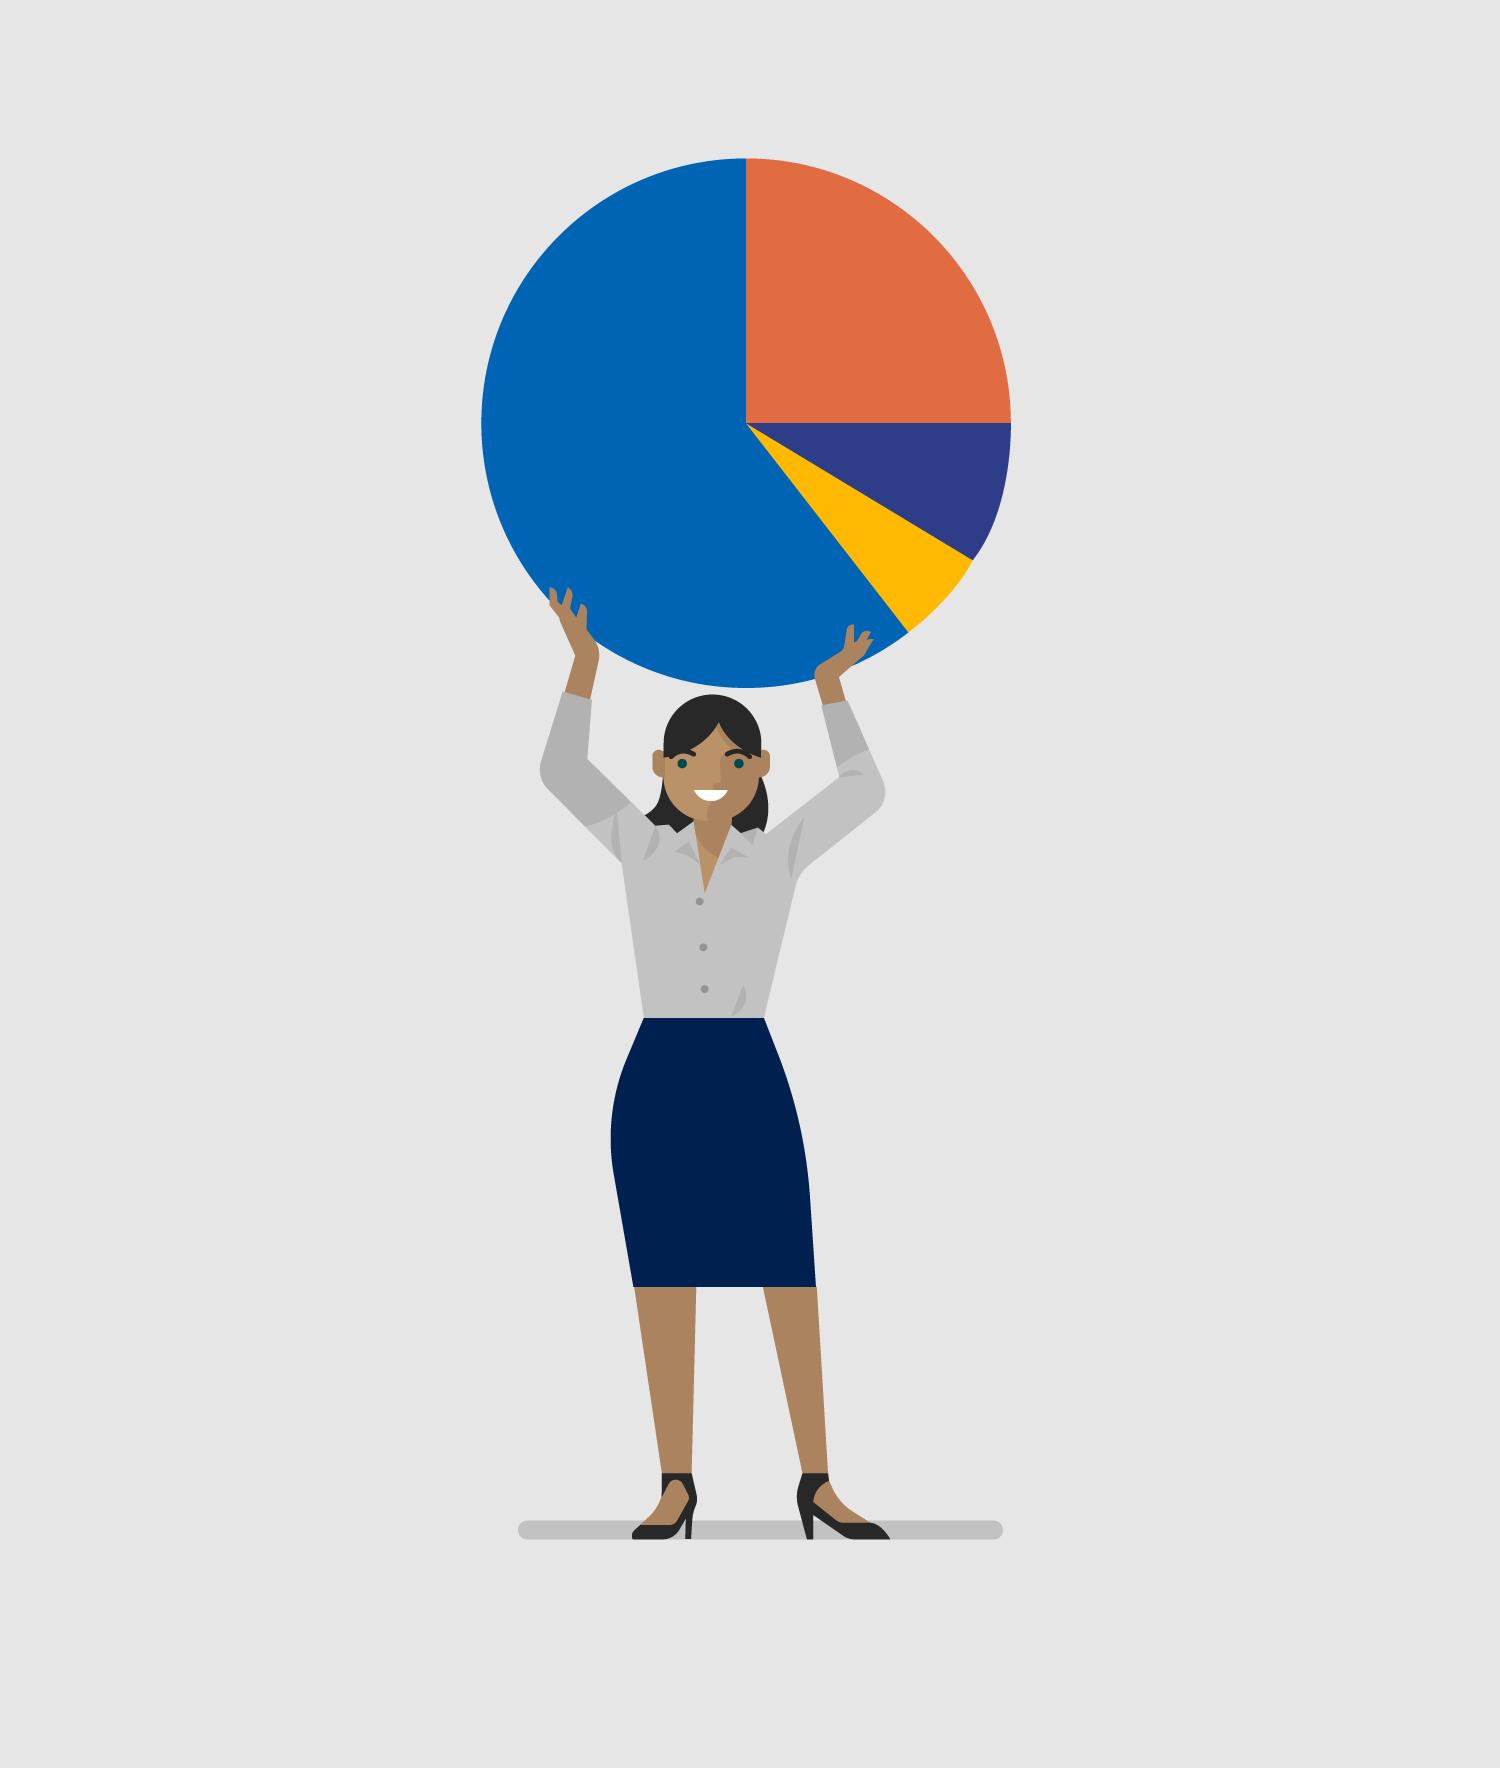 Microsoft_DannySchlitz_New_Illustration_strong_woman.png